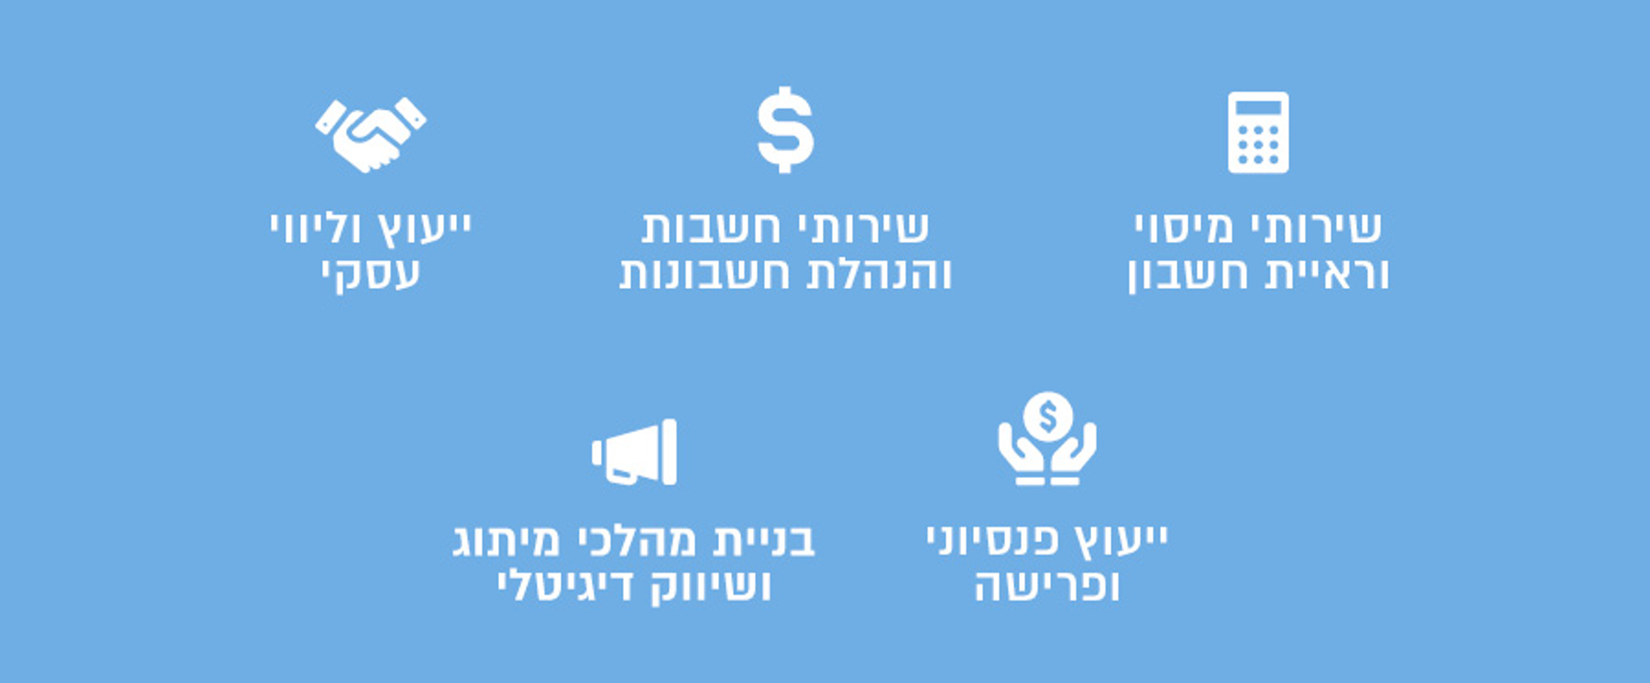 ICONIM_MEUHAD